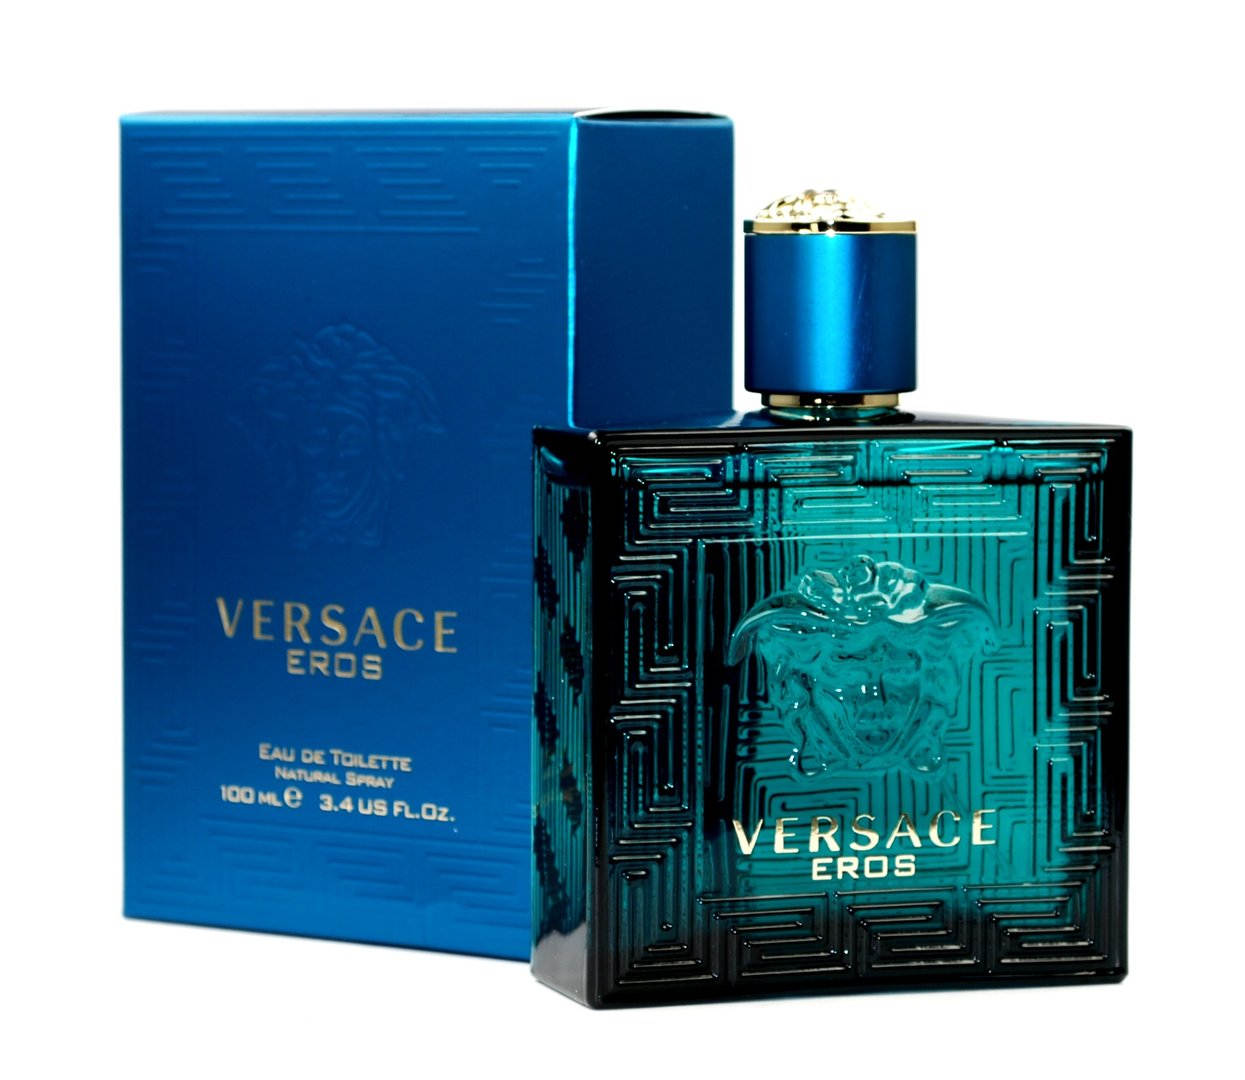 Best Smelling Cologne - Versace Eros